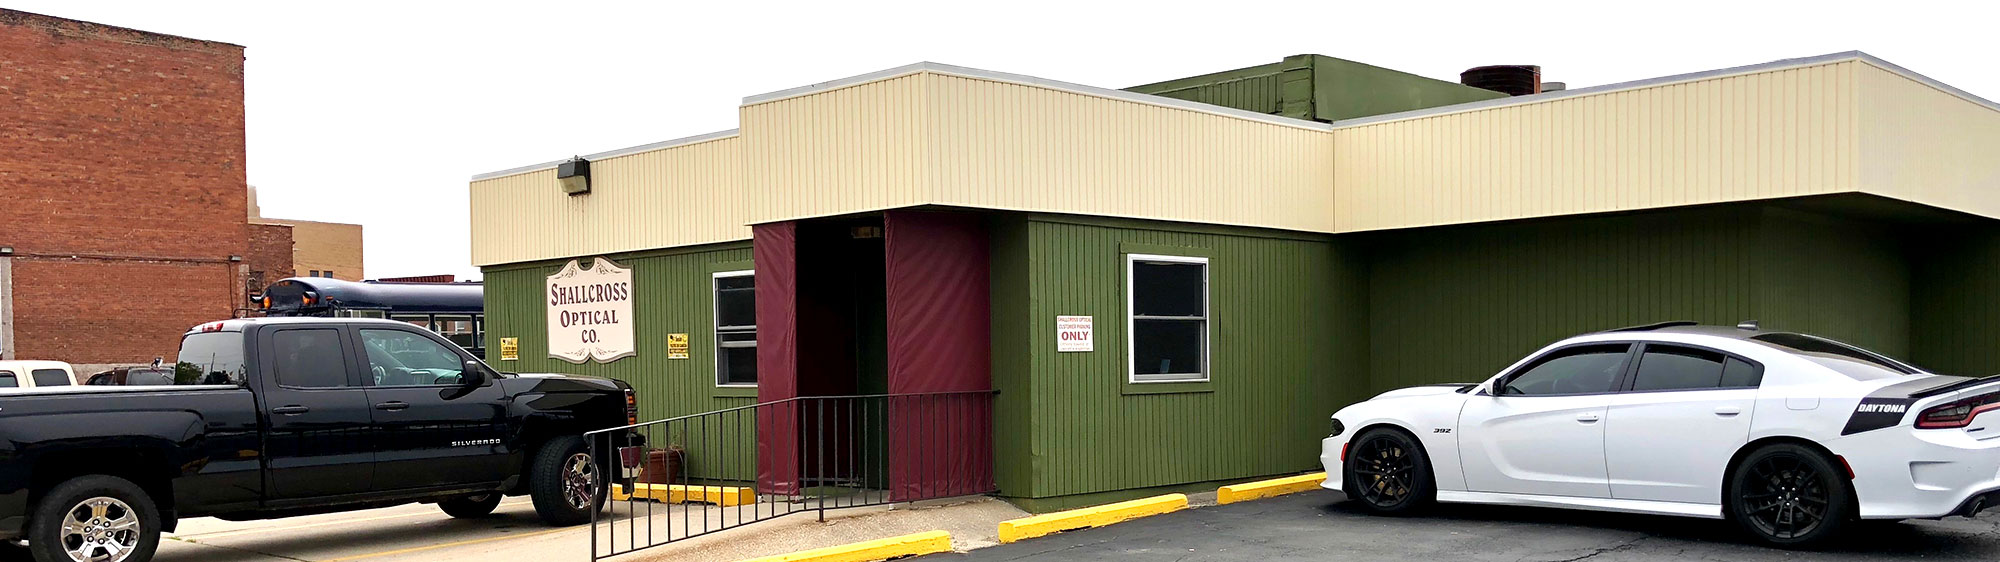 Exterior of building entrance